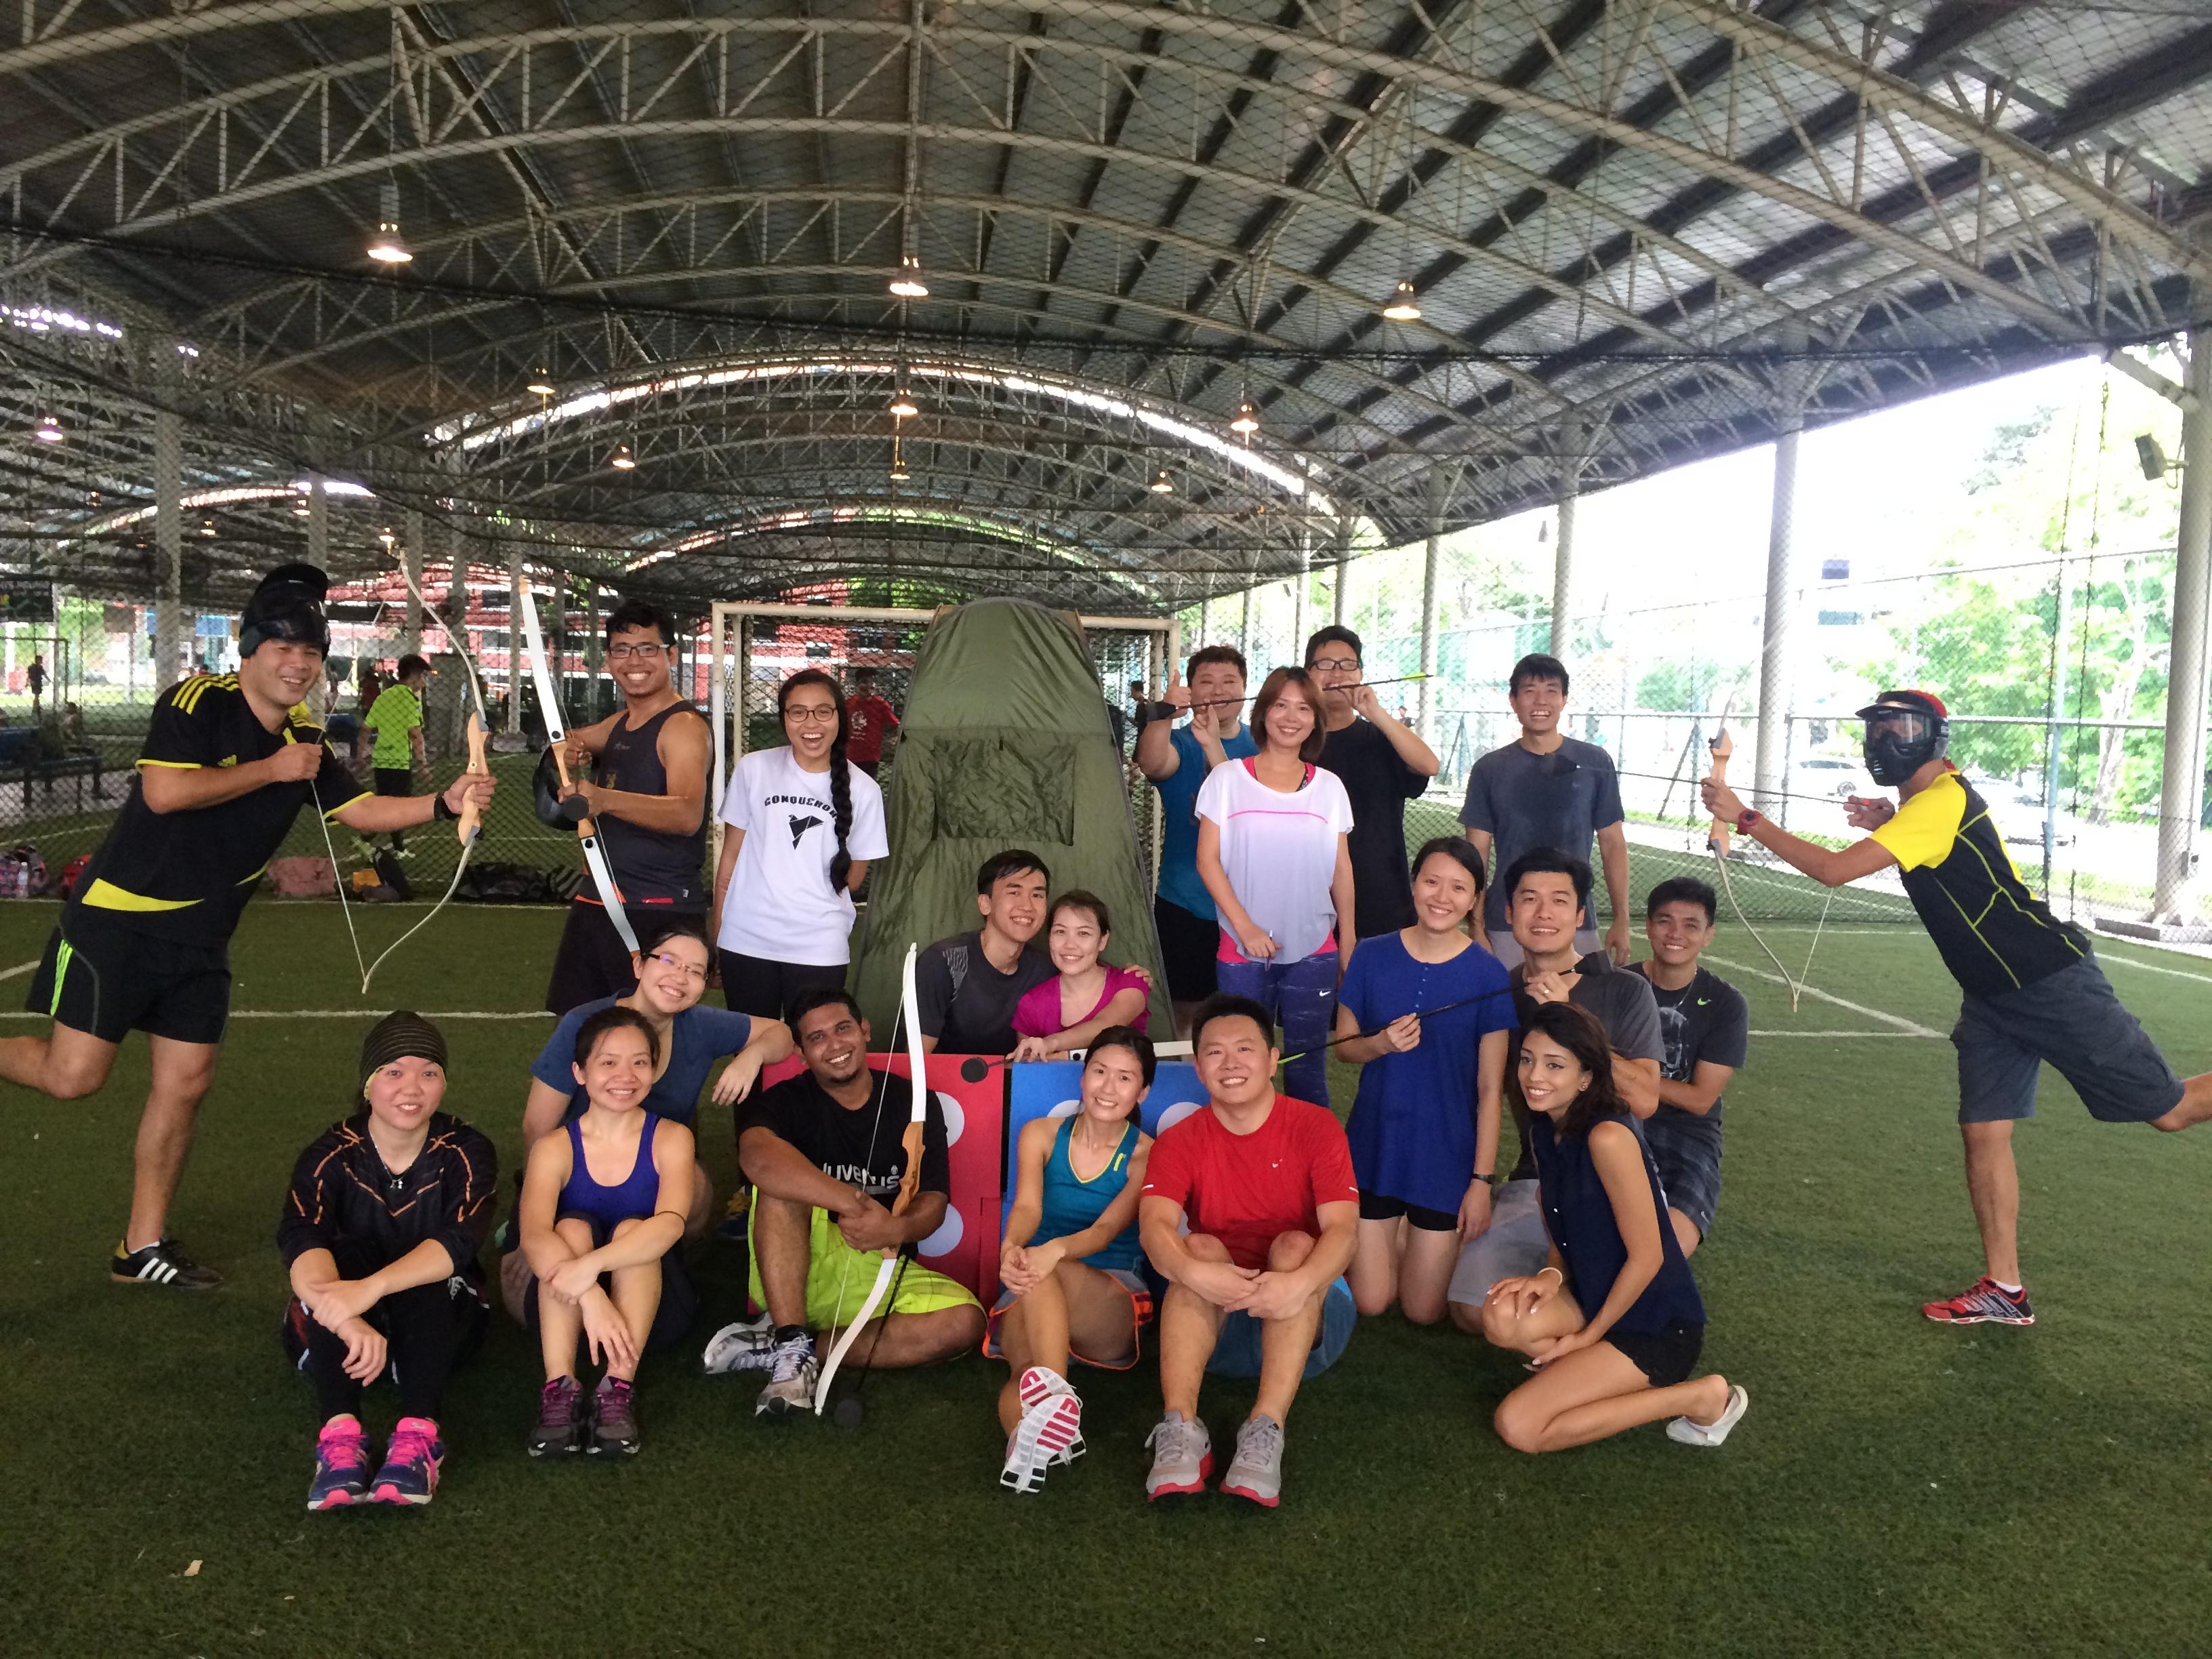 combat archery tag singapore the fun empire blog simin friends adventures combat archery tag